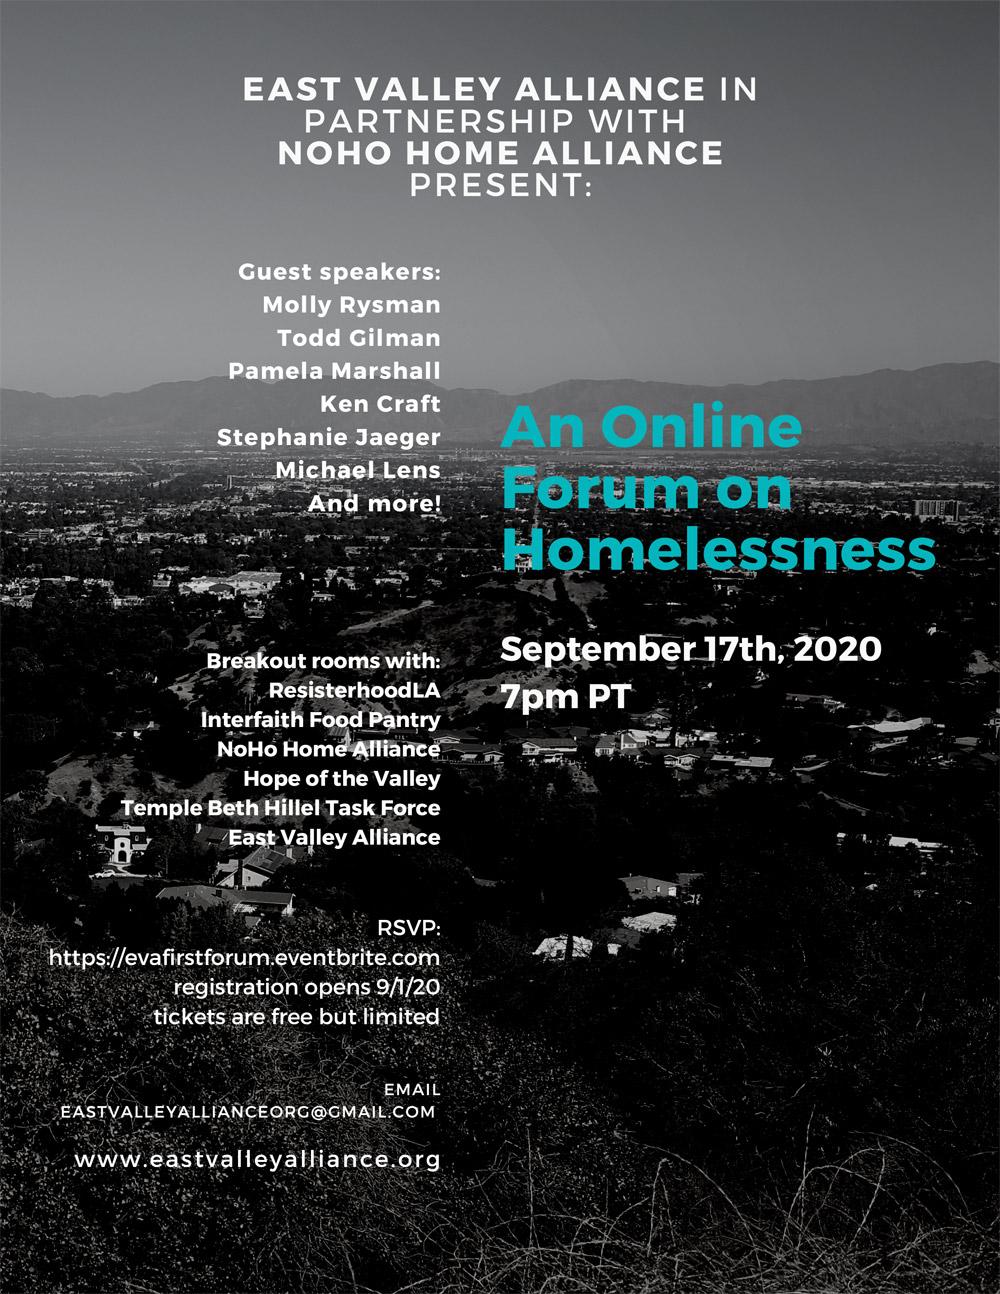 Forum on Homelessness